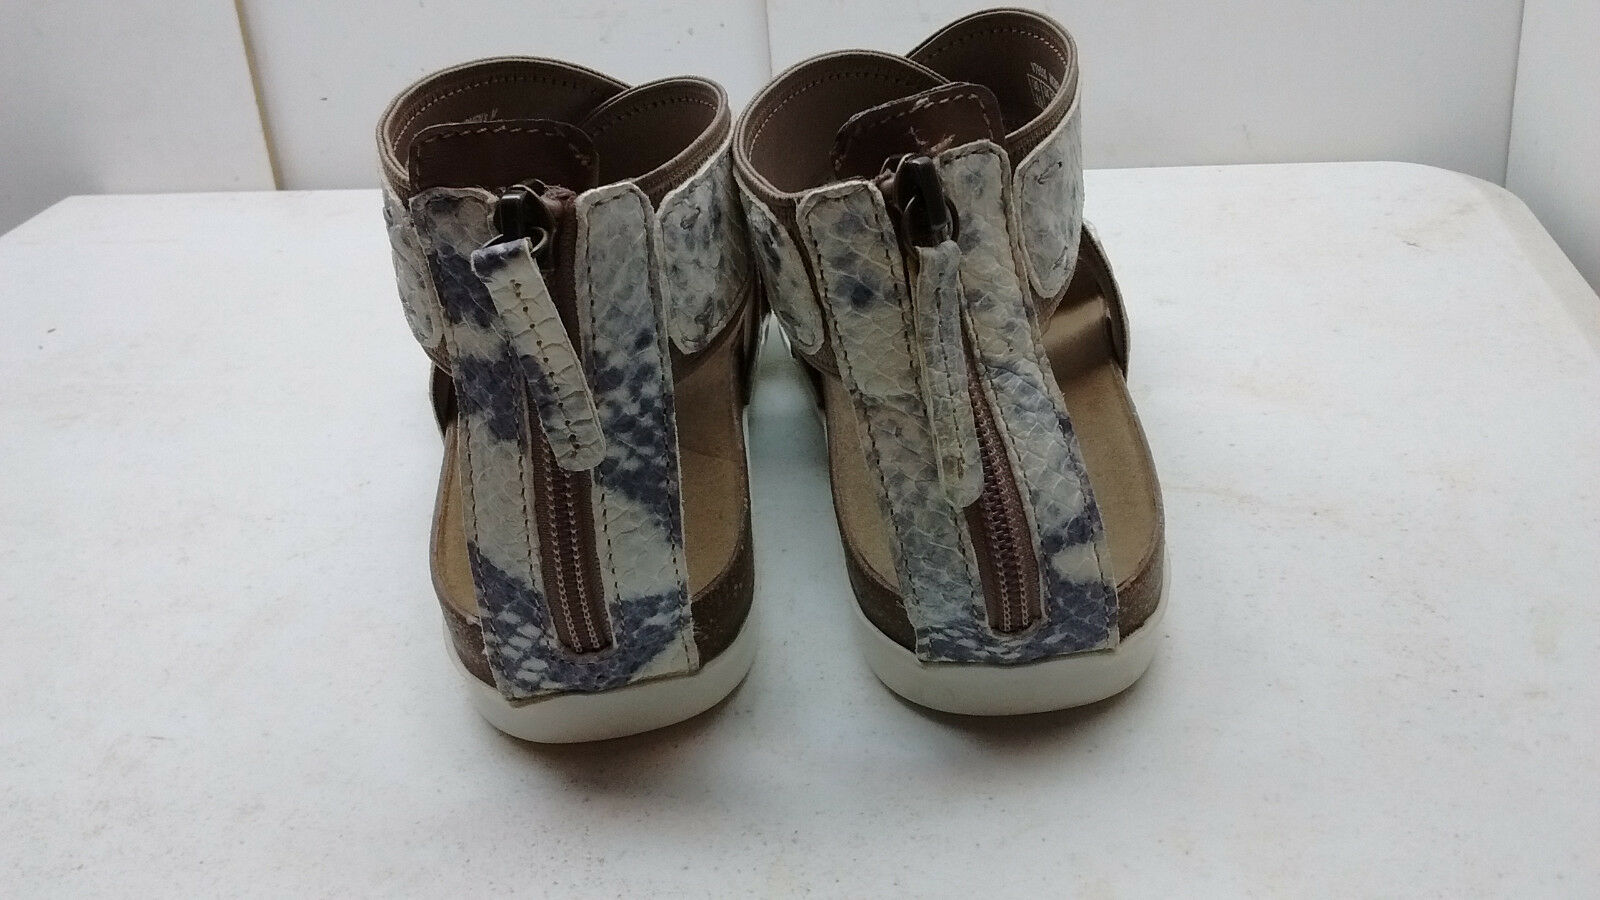 Rockport Women White Animal Print Leather Zip Zip Zip Gladiator Sandal shoes Size 6.5M 37 b51e42